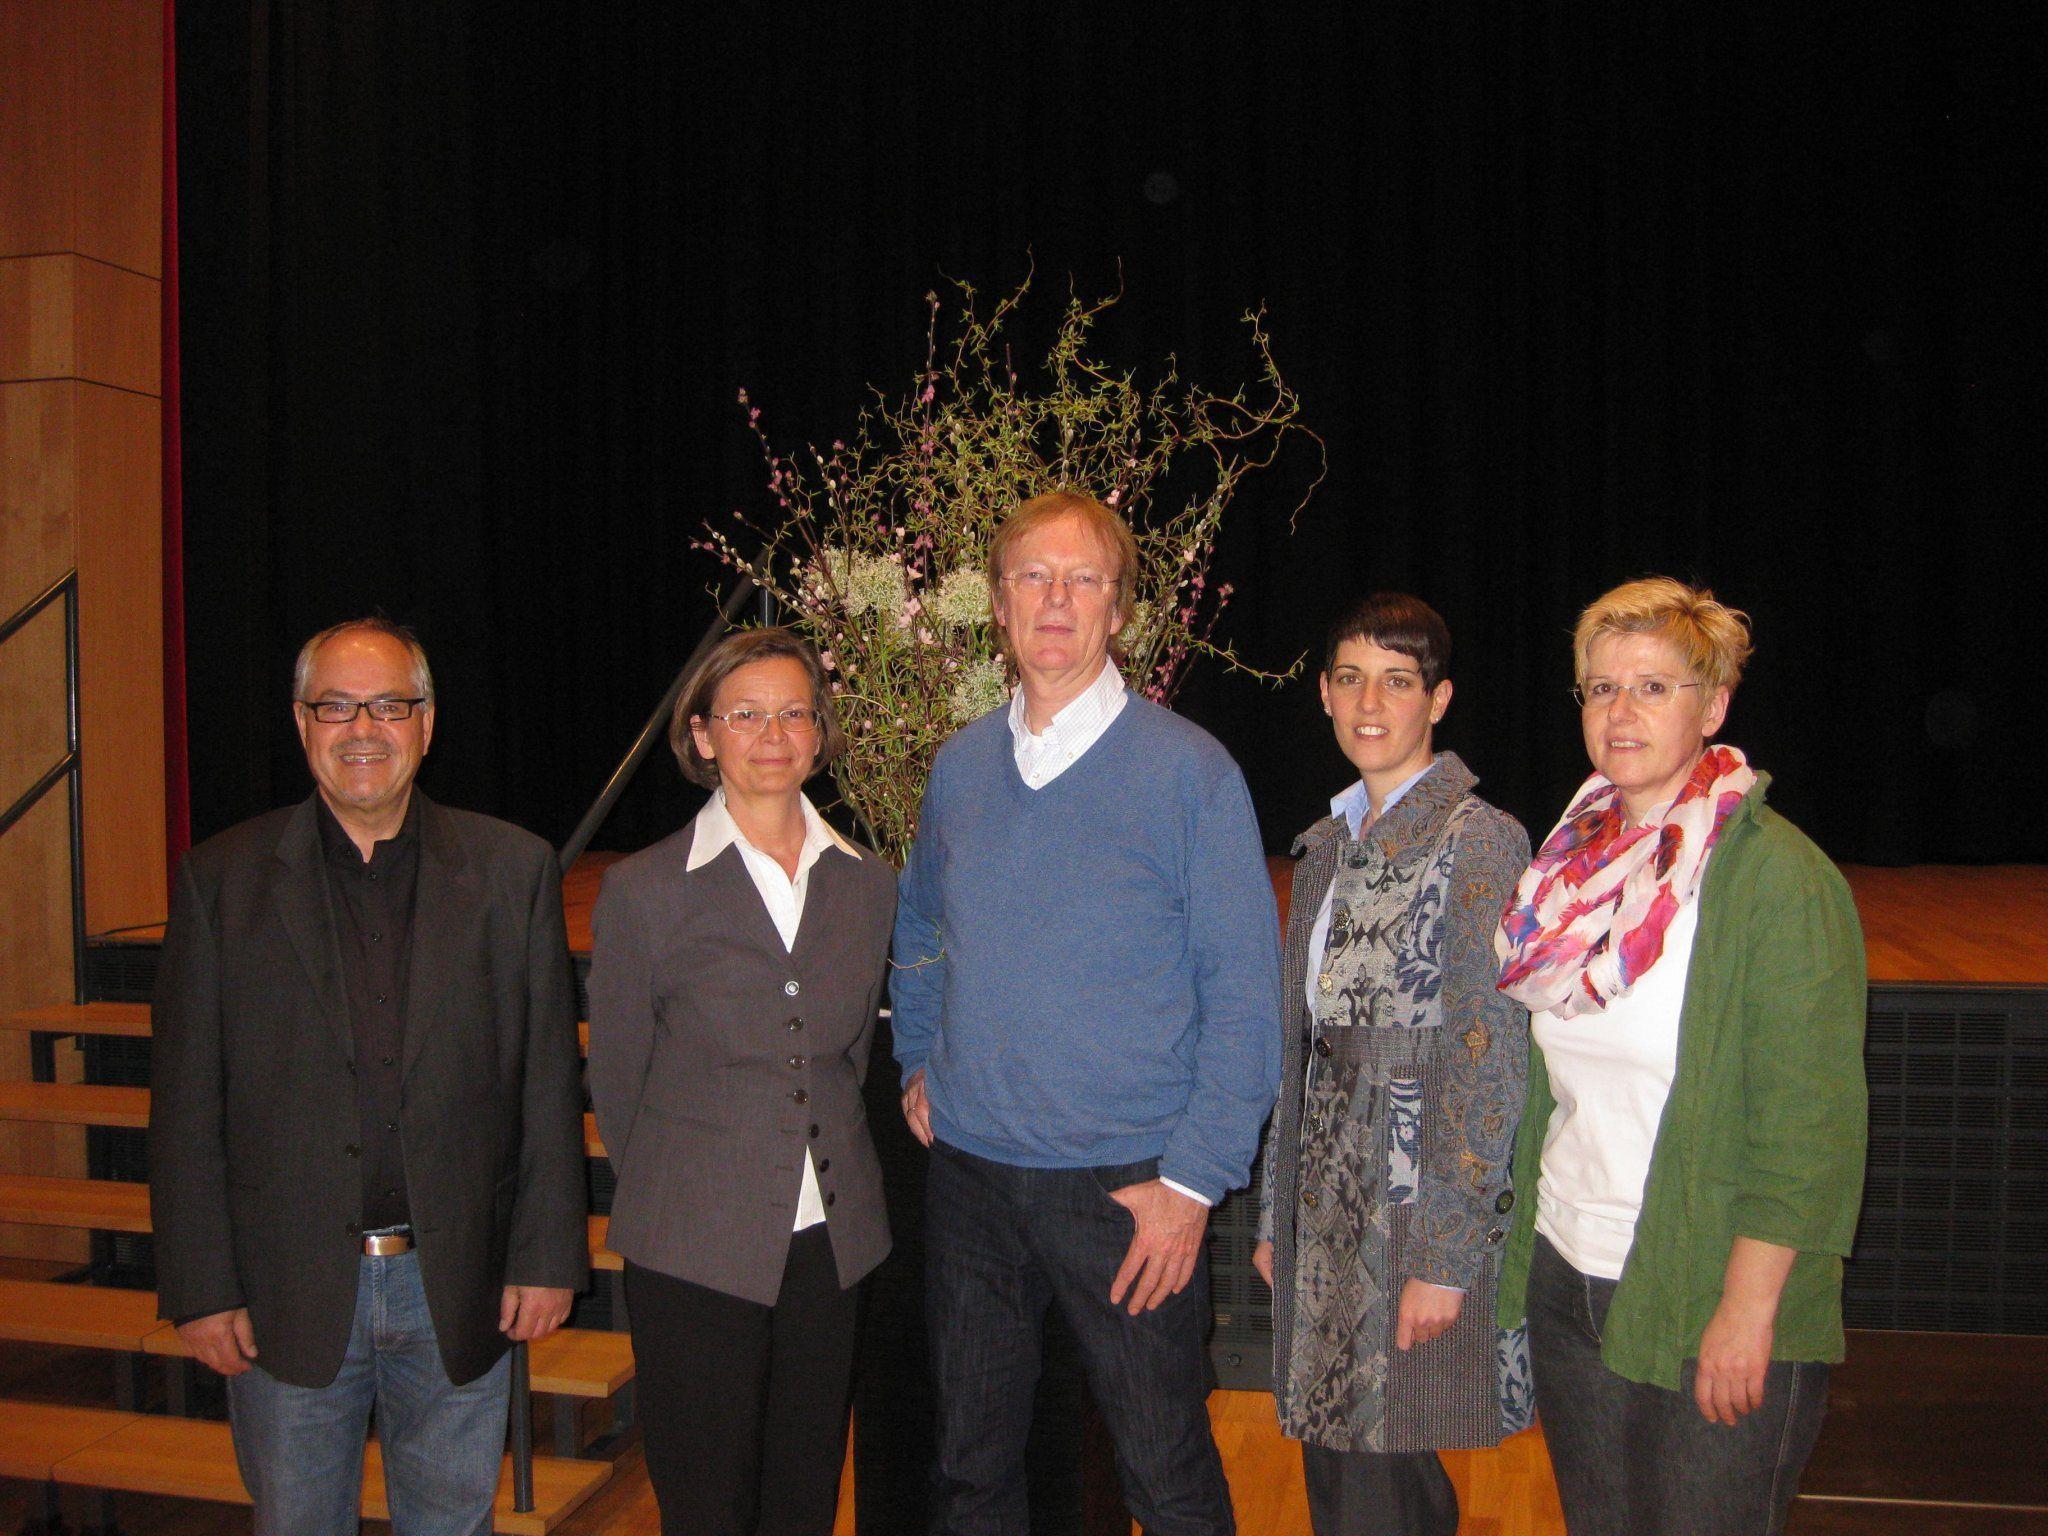 Kurt Hämmerle, Gerda Schmid, Prof. Dr. Günter Funke, Susanna Ajkovic , Dr. Kriemhild Büchel-Kapeller.